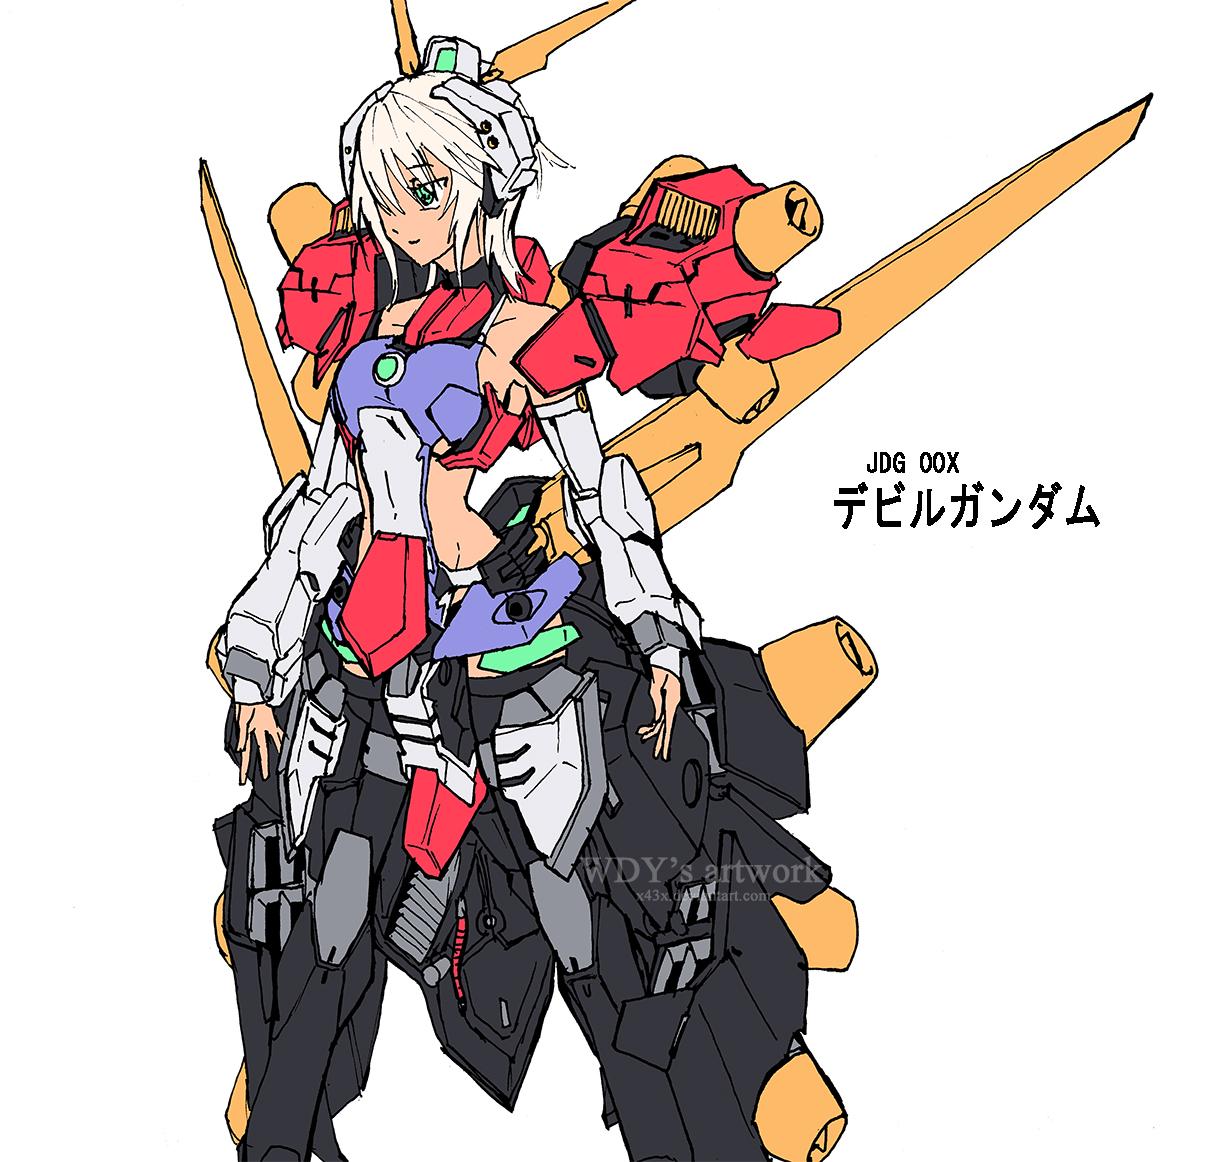 Devil Gundam Mecha Musume by wdy1000 on DeviantArt